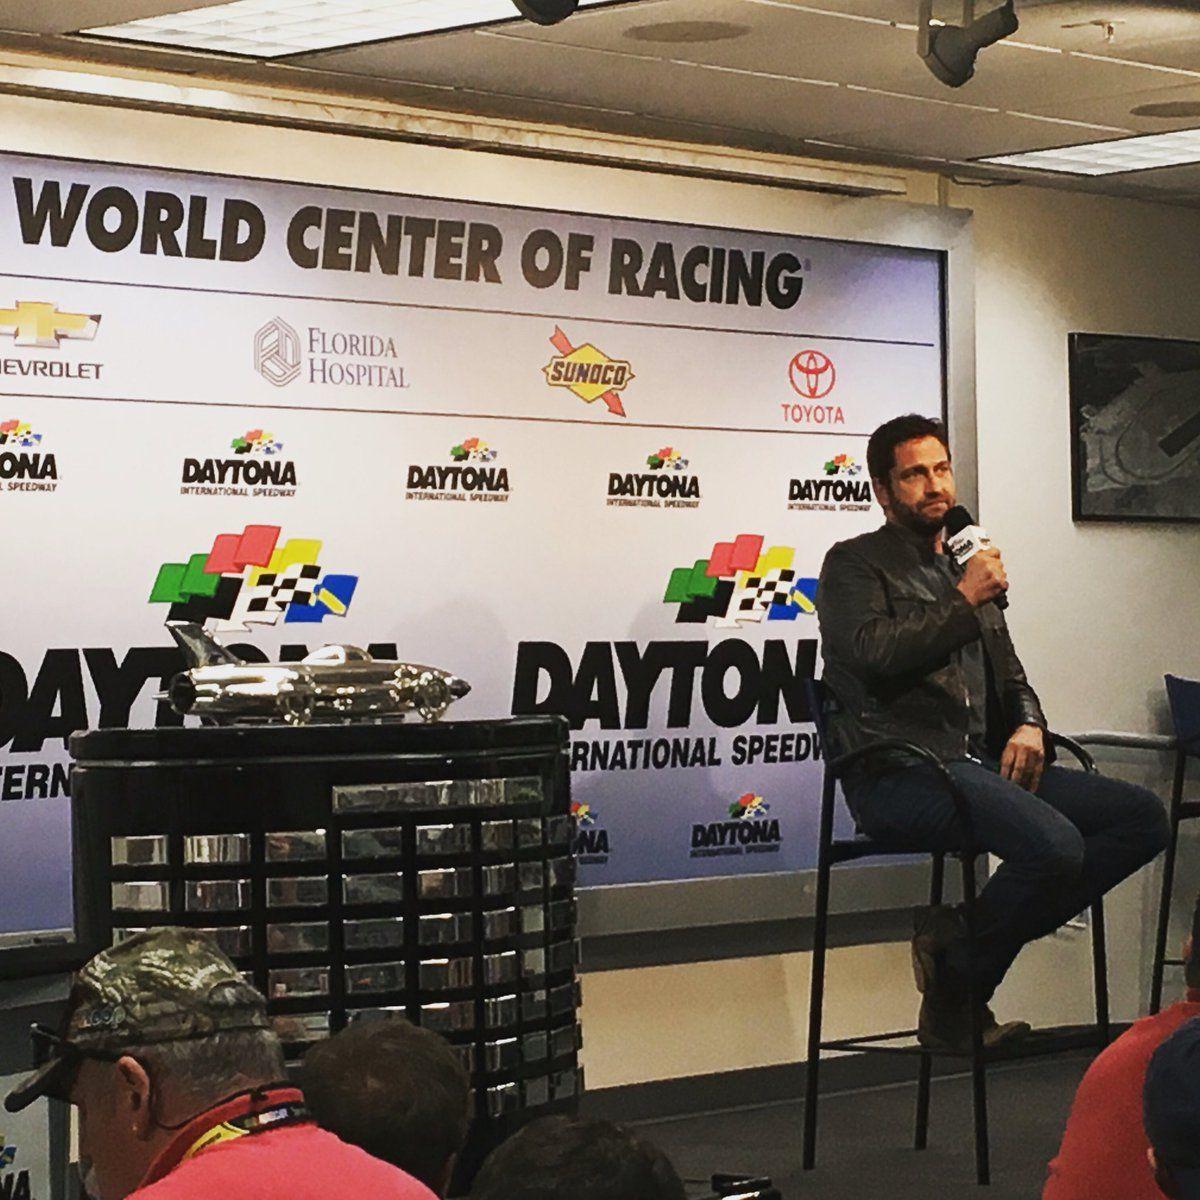 "Lionel Racing on Twitter: ""Gerard Butler has the media center in stitches #Daytona500 https://t.co/k4tAVkSOAQ"""